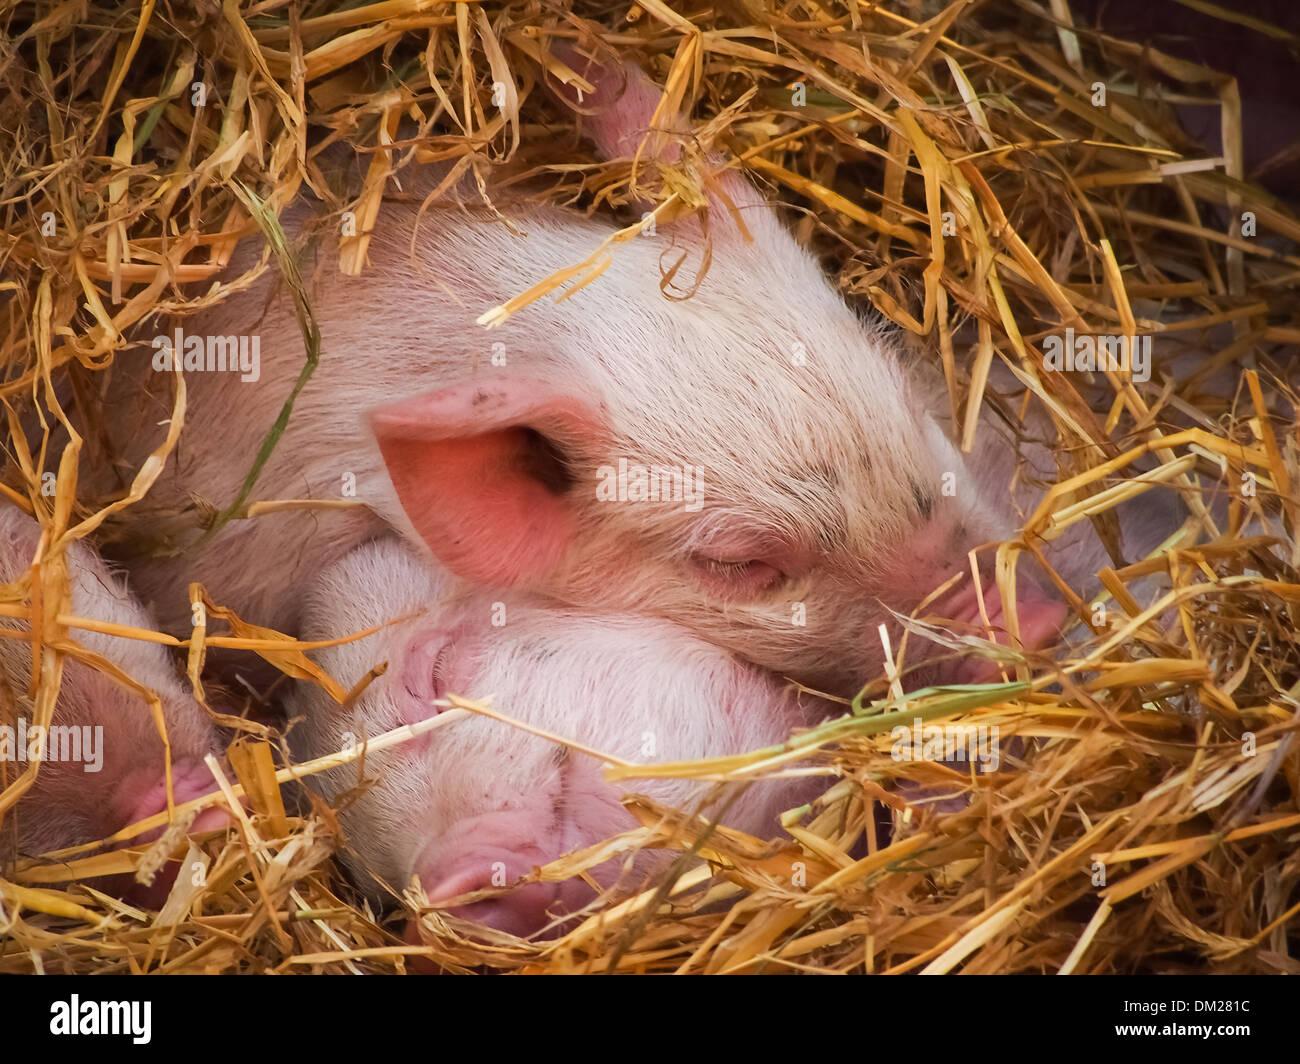 tamworth-piglets-sleeping-in-hay-DM281C.jpg